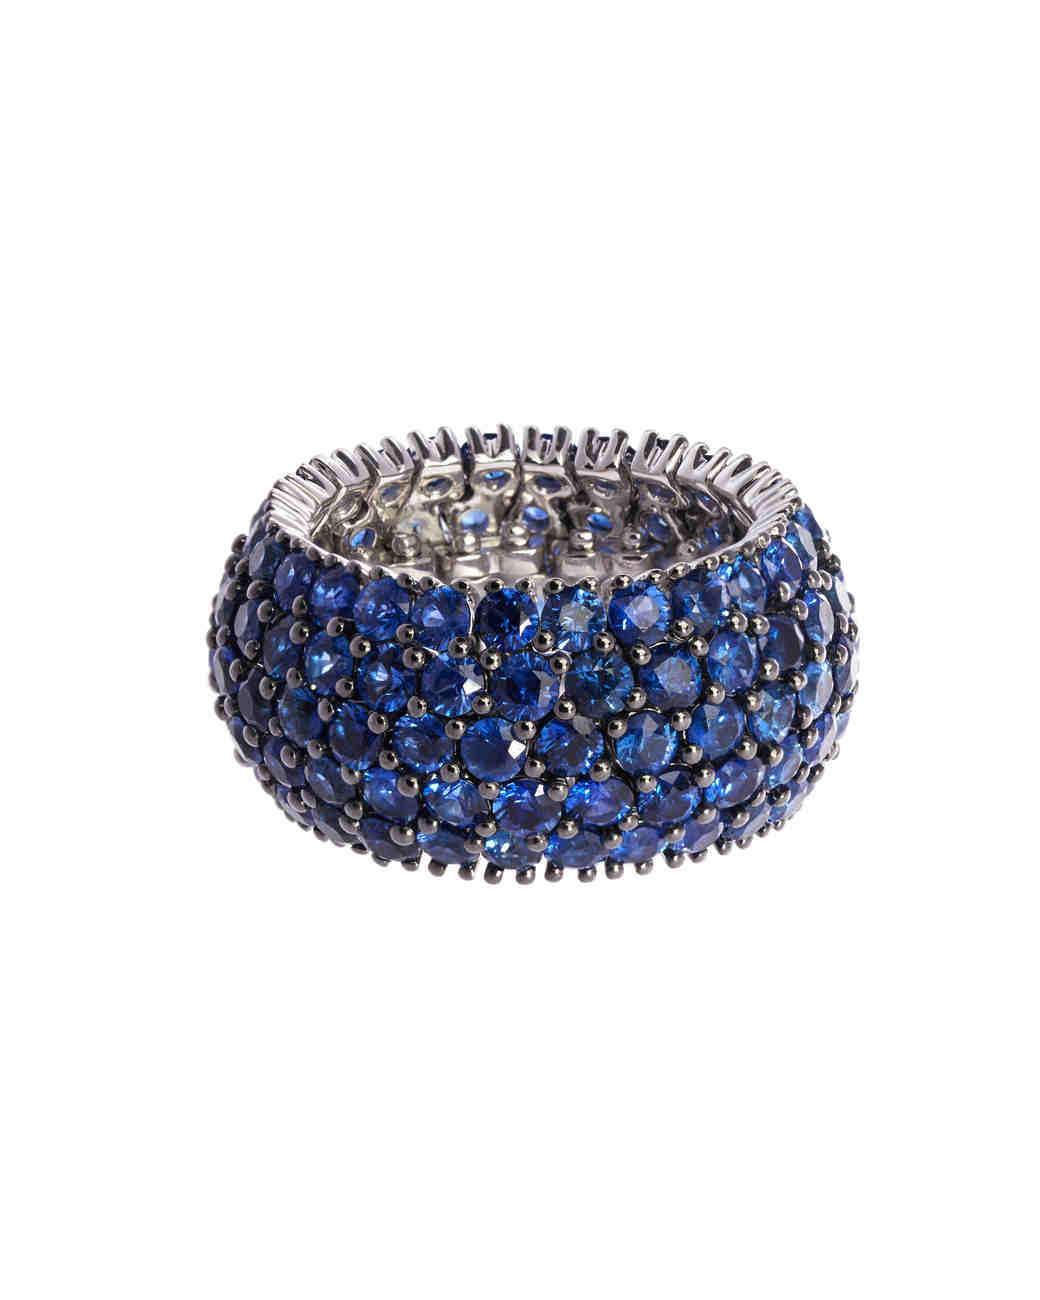 colored-engagement-rings-sidney-garber-black-rhodium-sapphires-0316.jpg